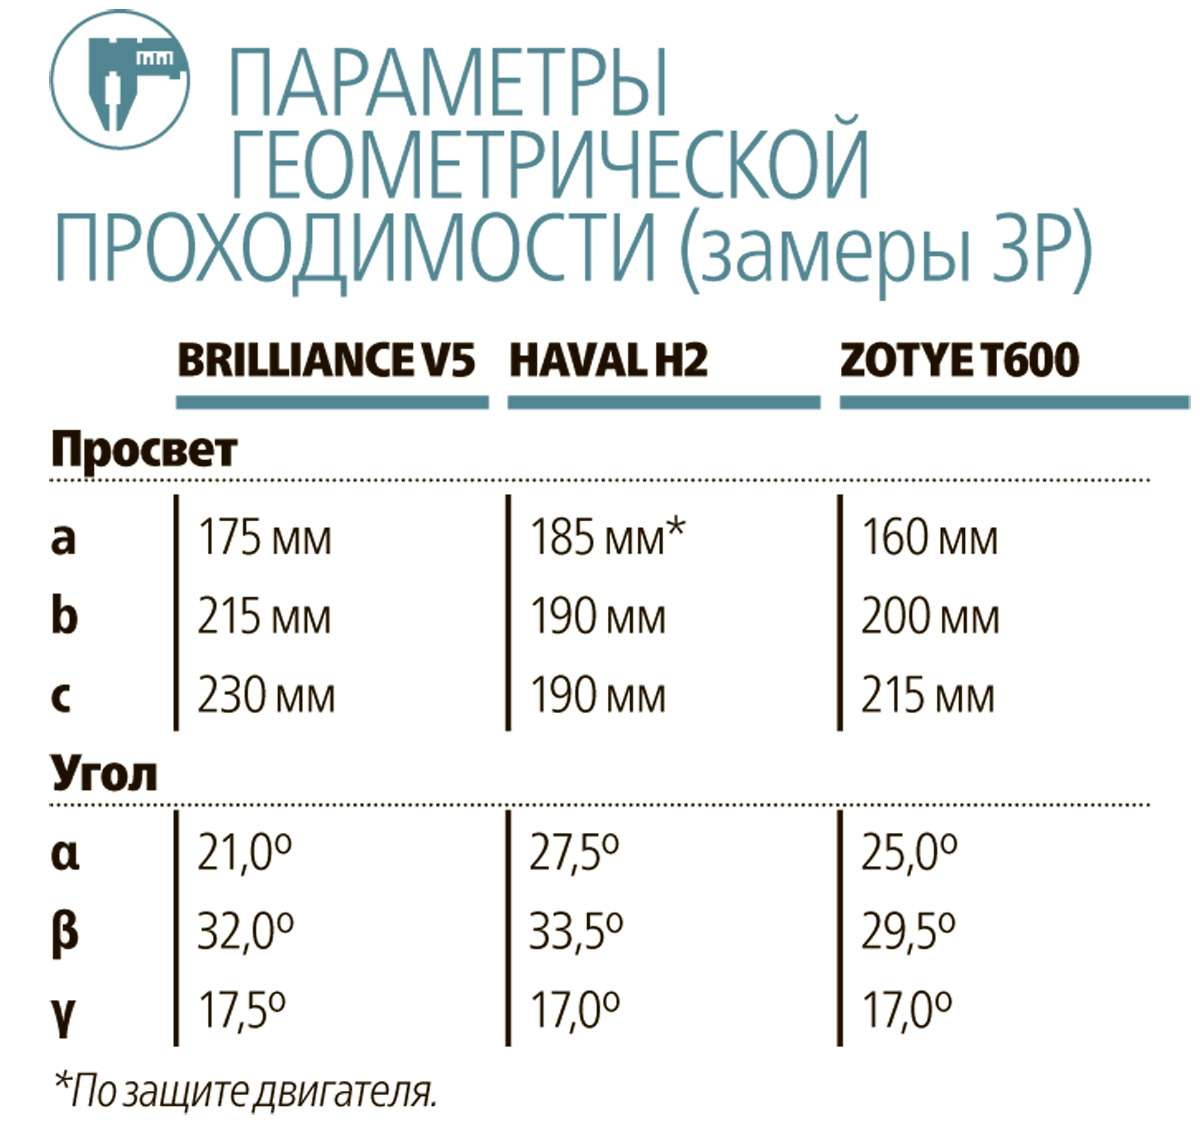 Brilliance V5, Zotye T600и Haval H2: голодные игры— фото 608136